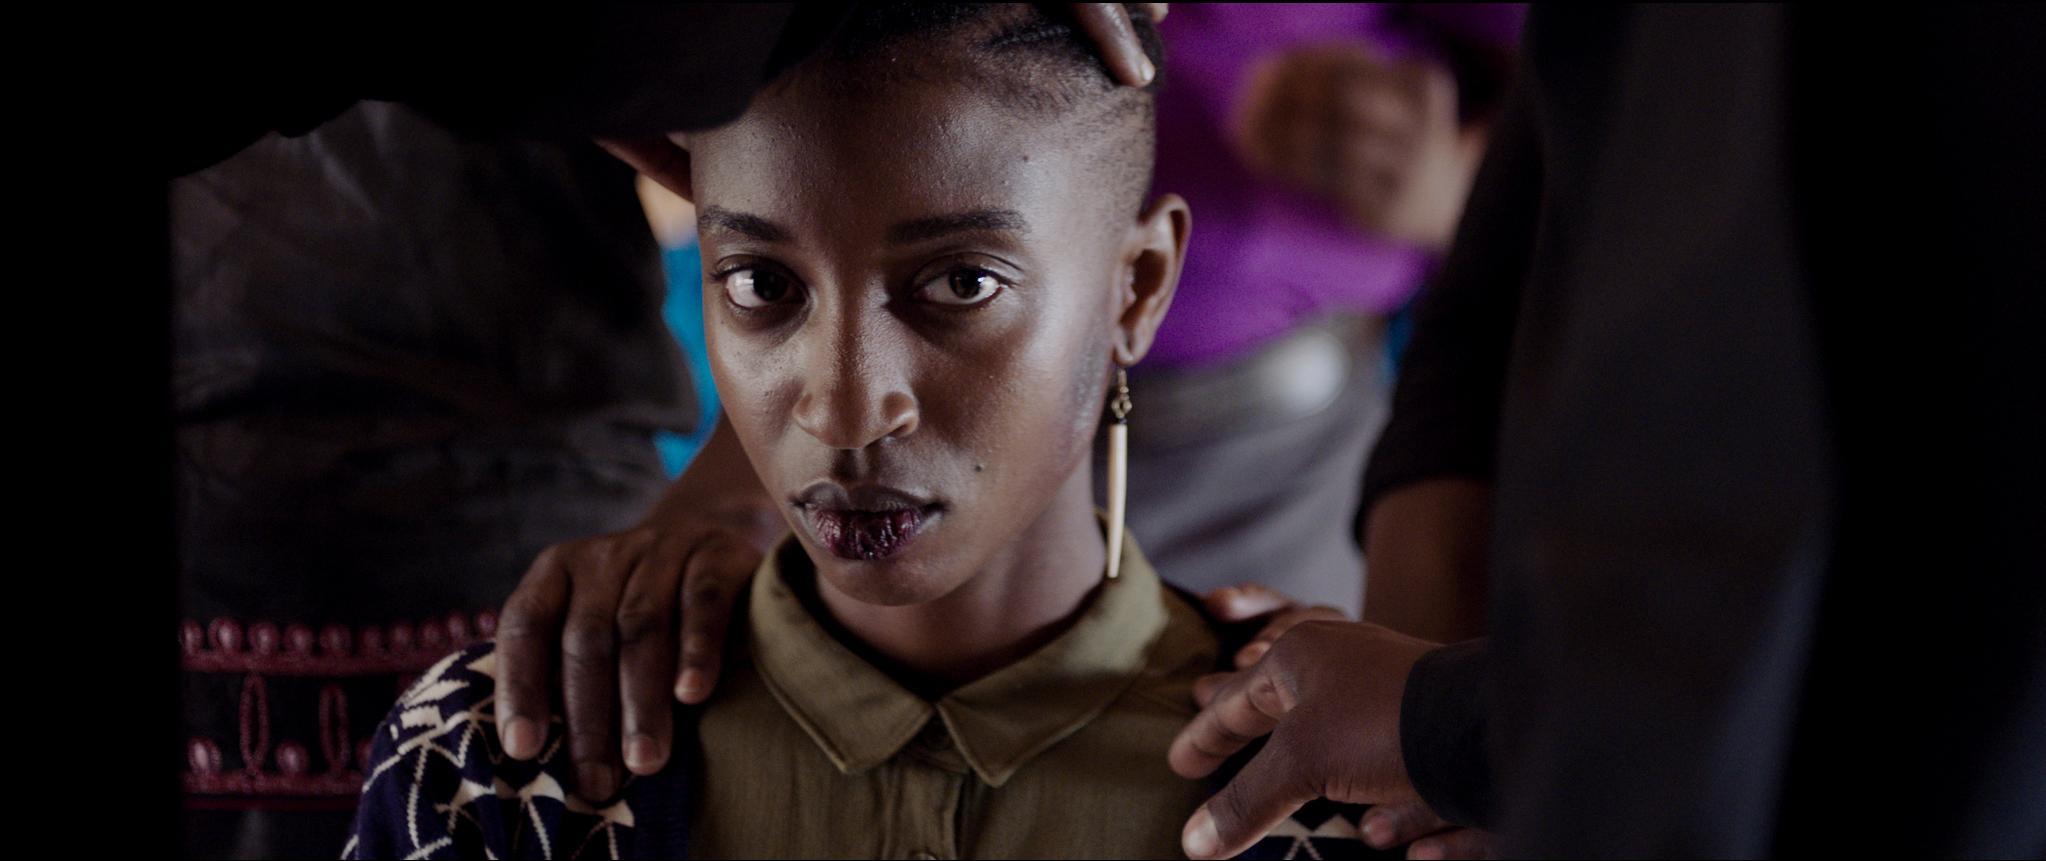 Rafiki  feat. Sheila Mugyiva - production still courtesy of Big World Cinema